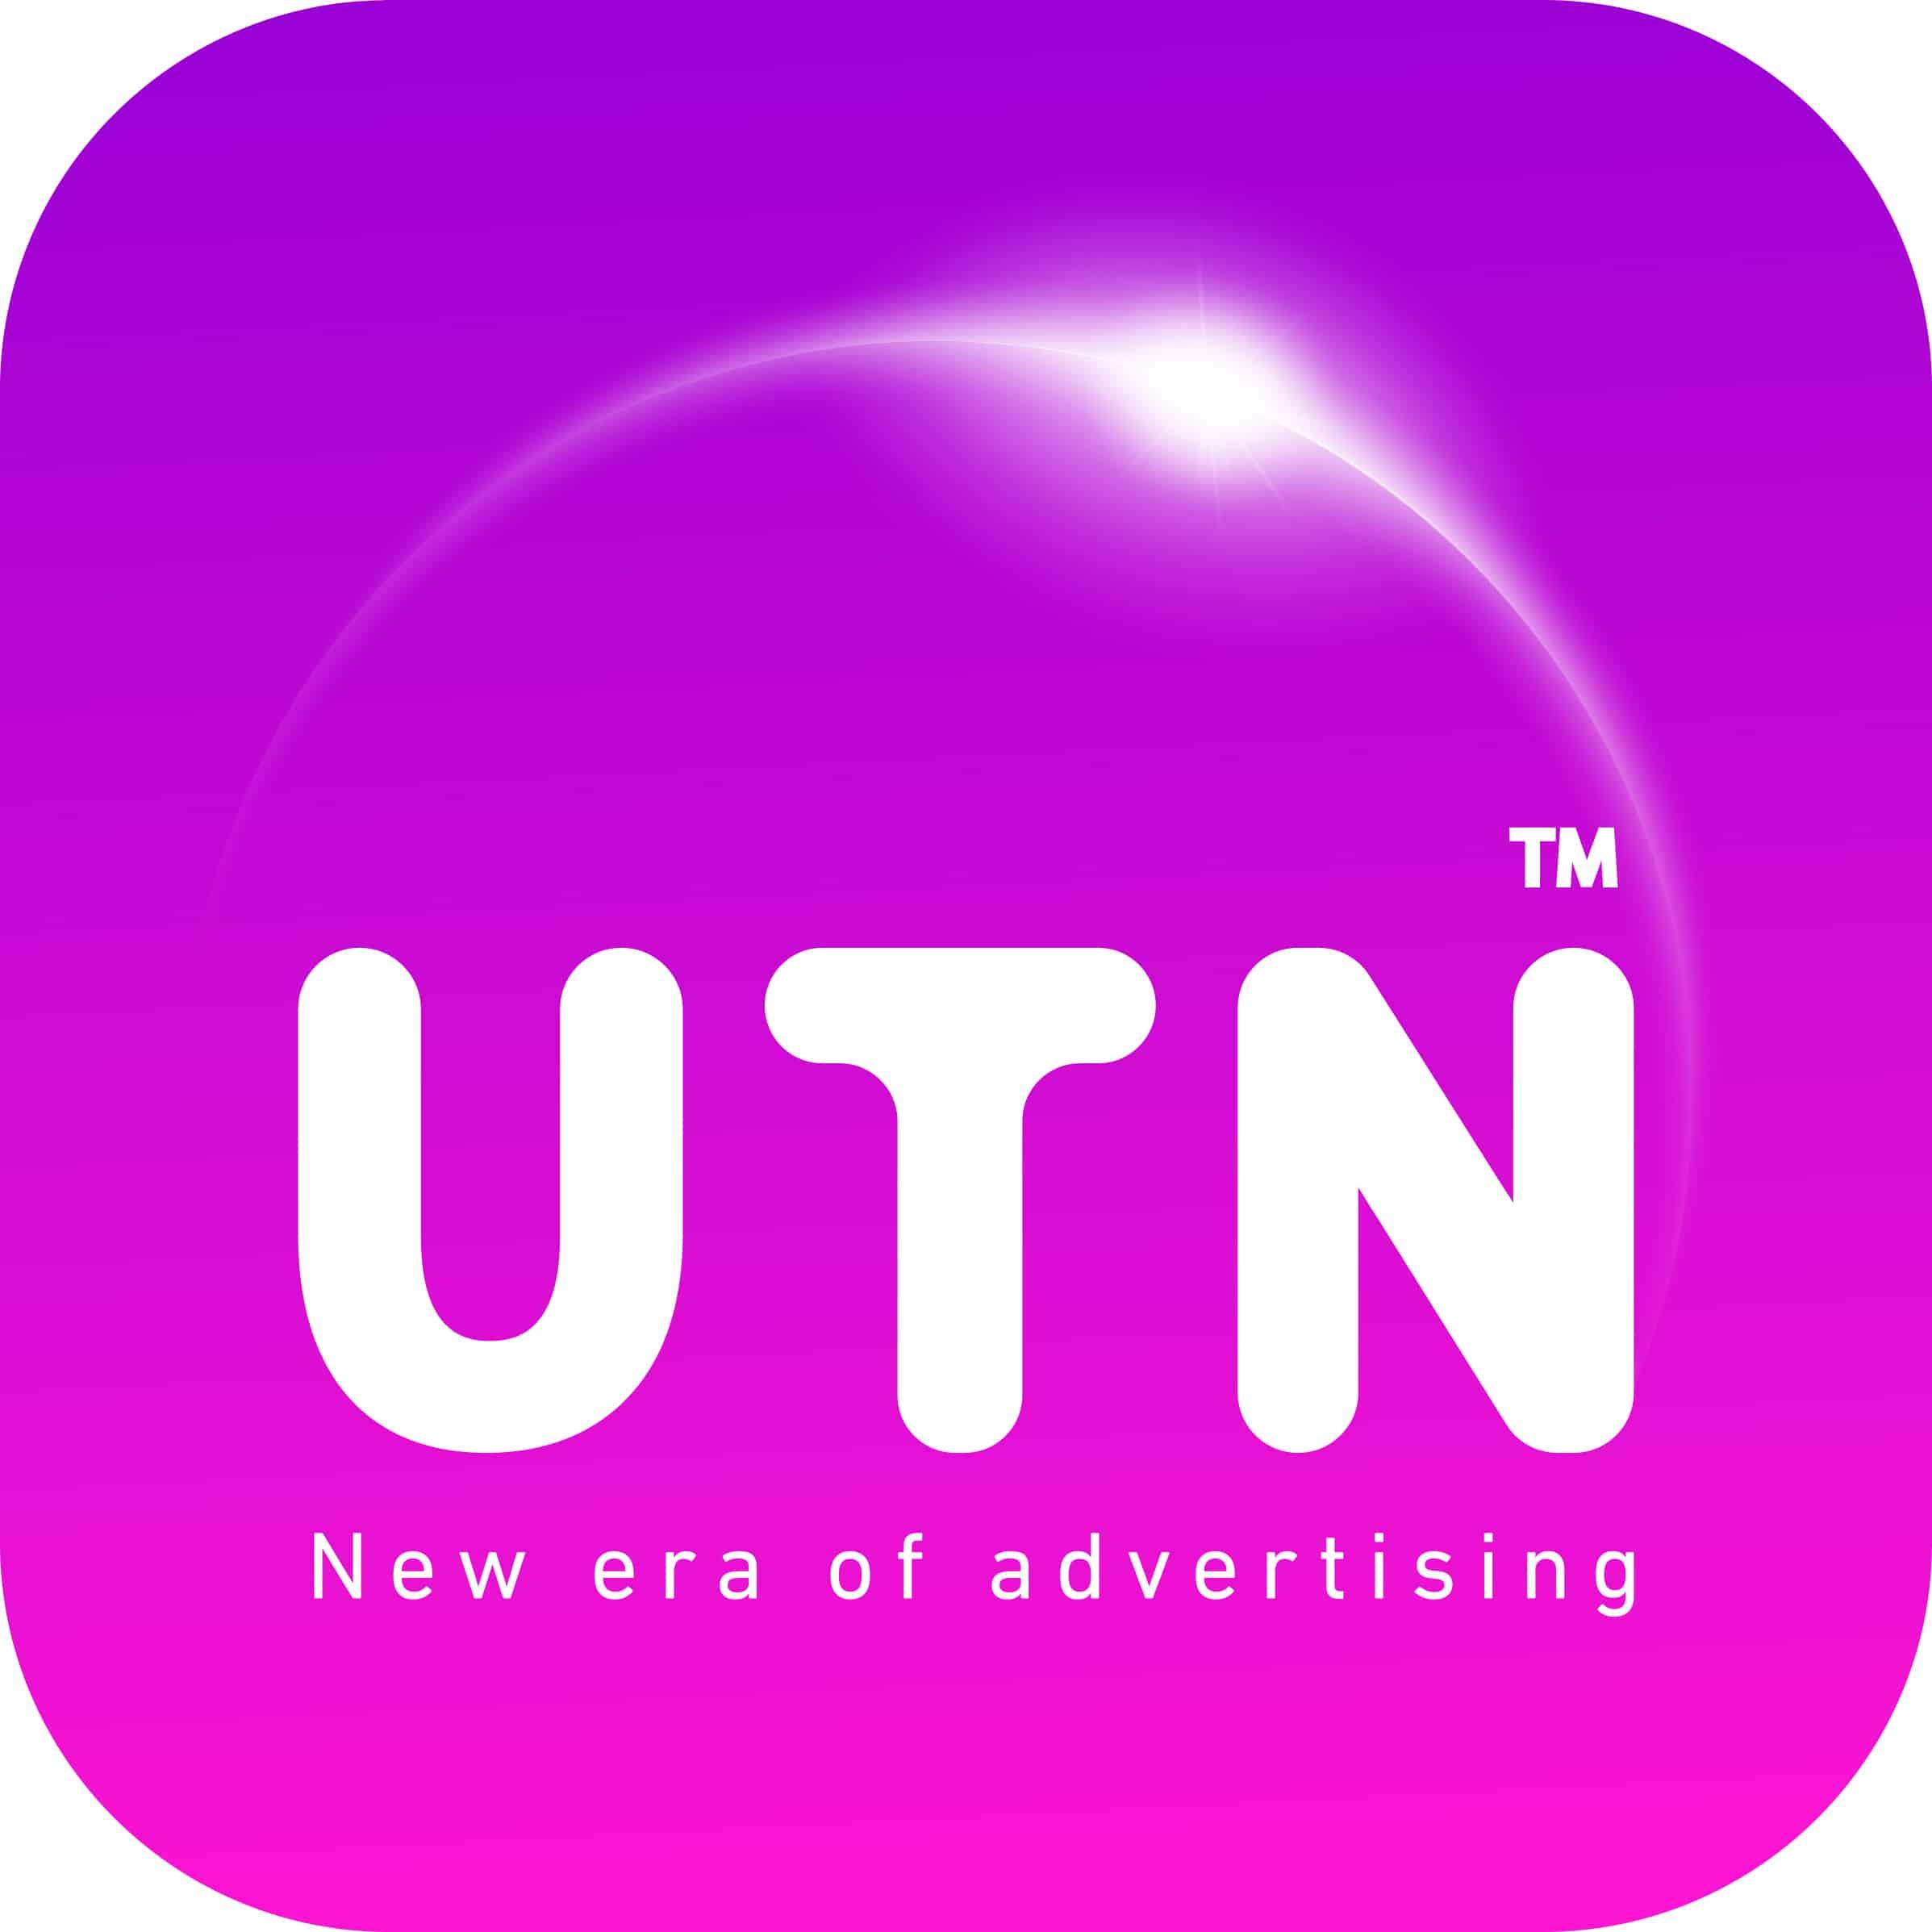 UTN - new era of advertising